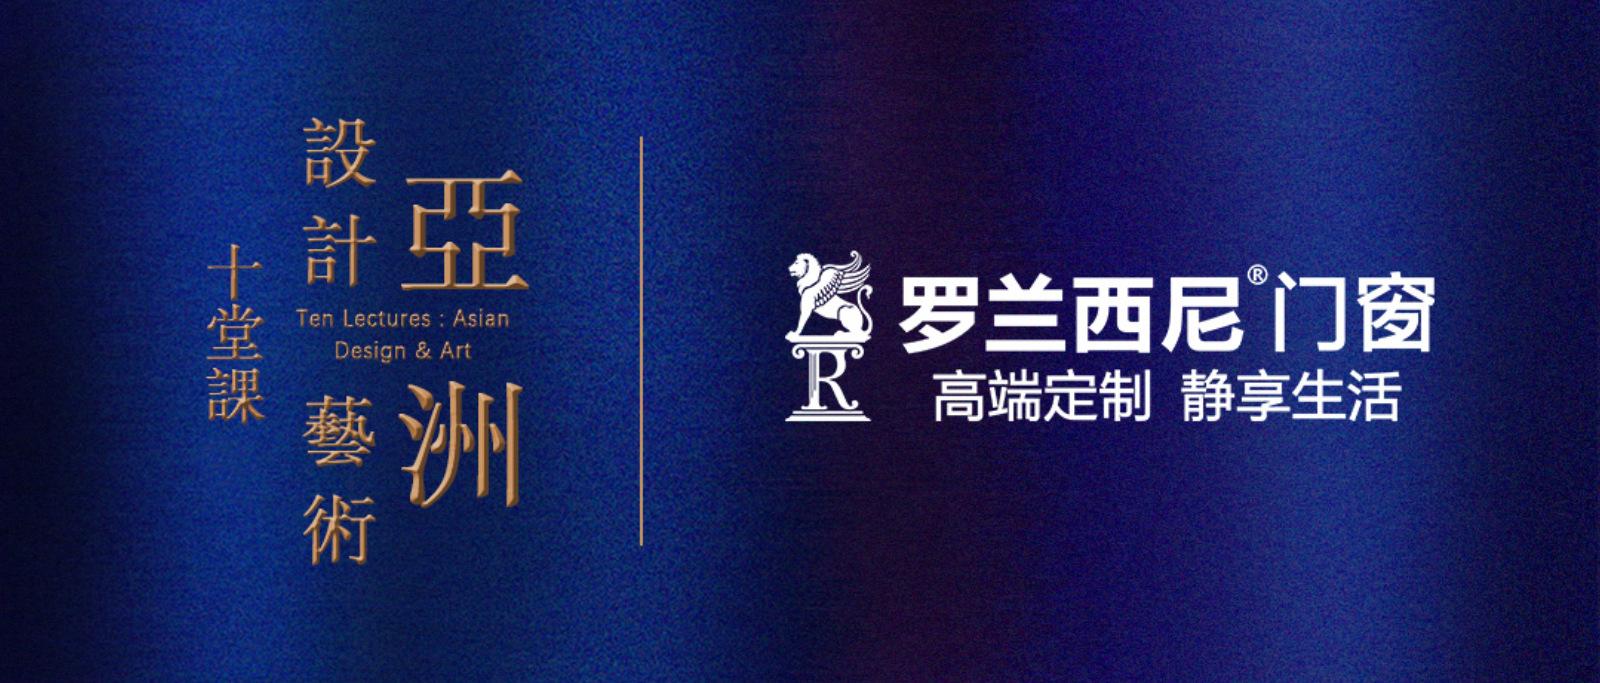 十堂课首页banner